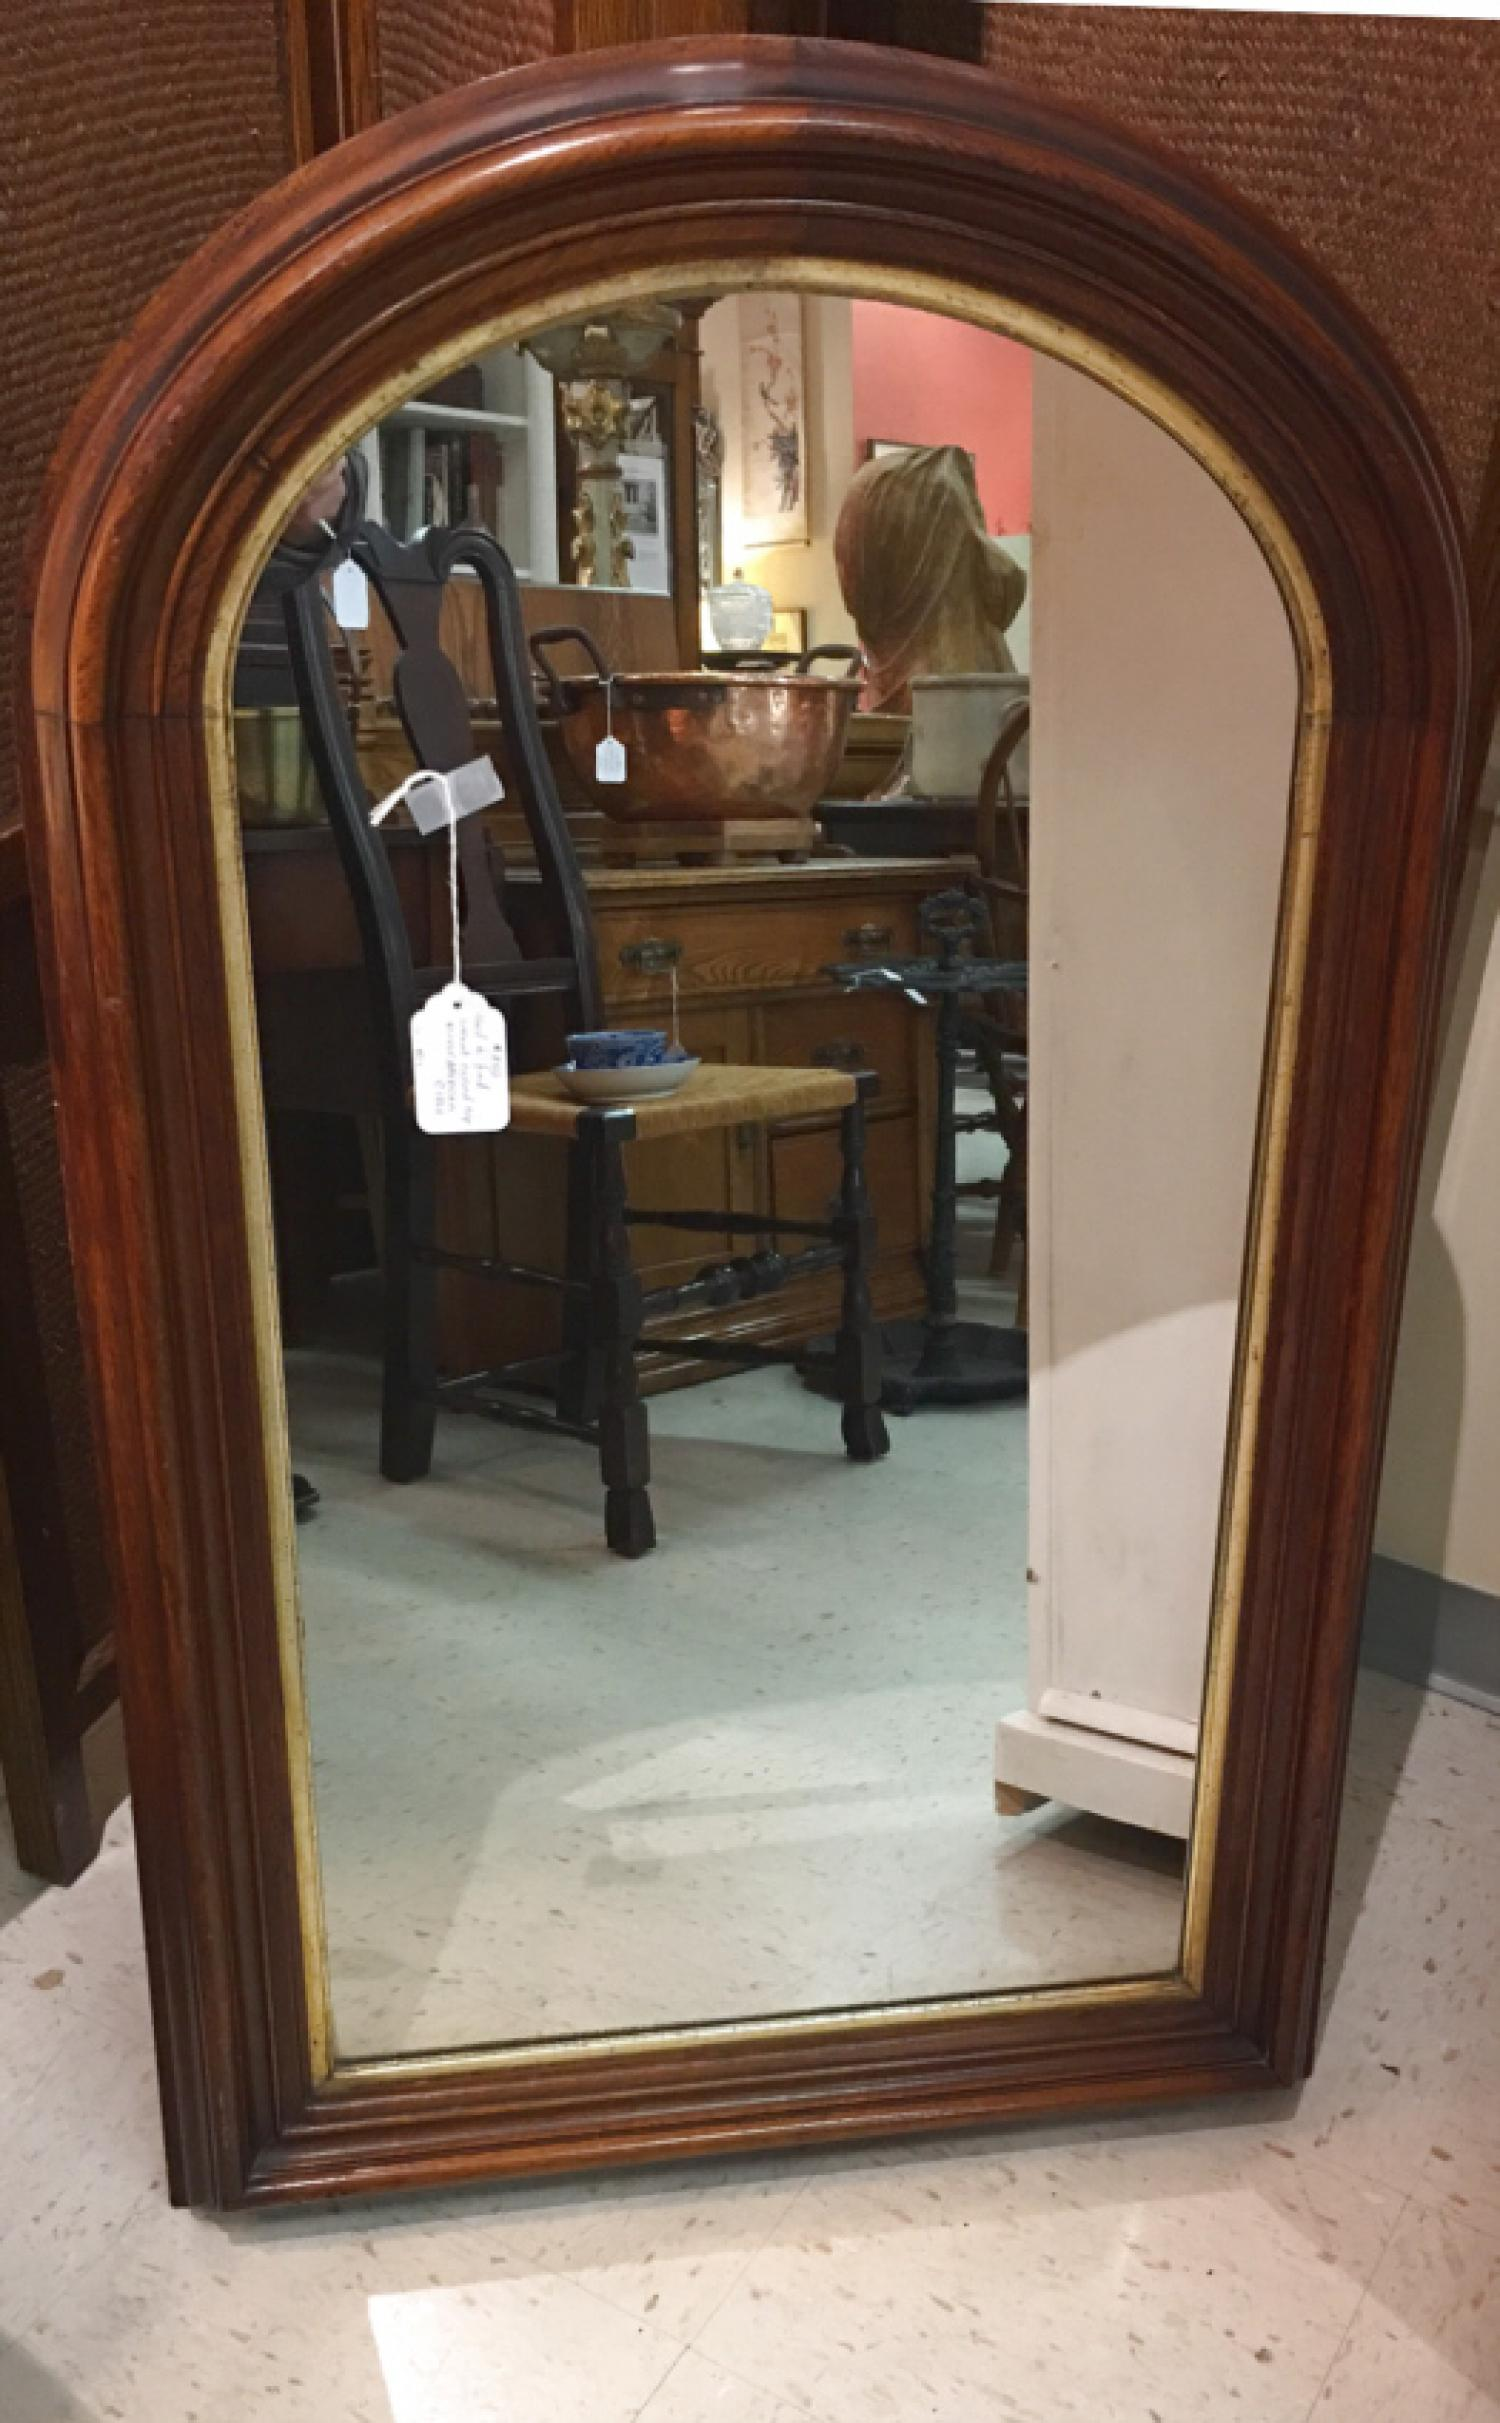 American Victorian walnut arch top mirror c1870